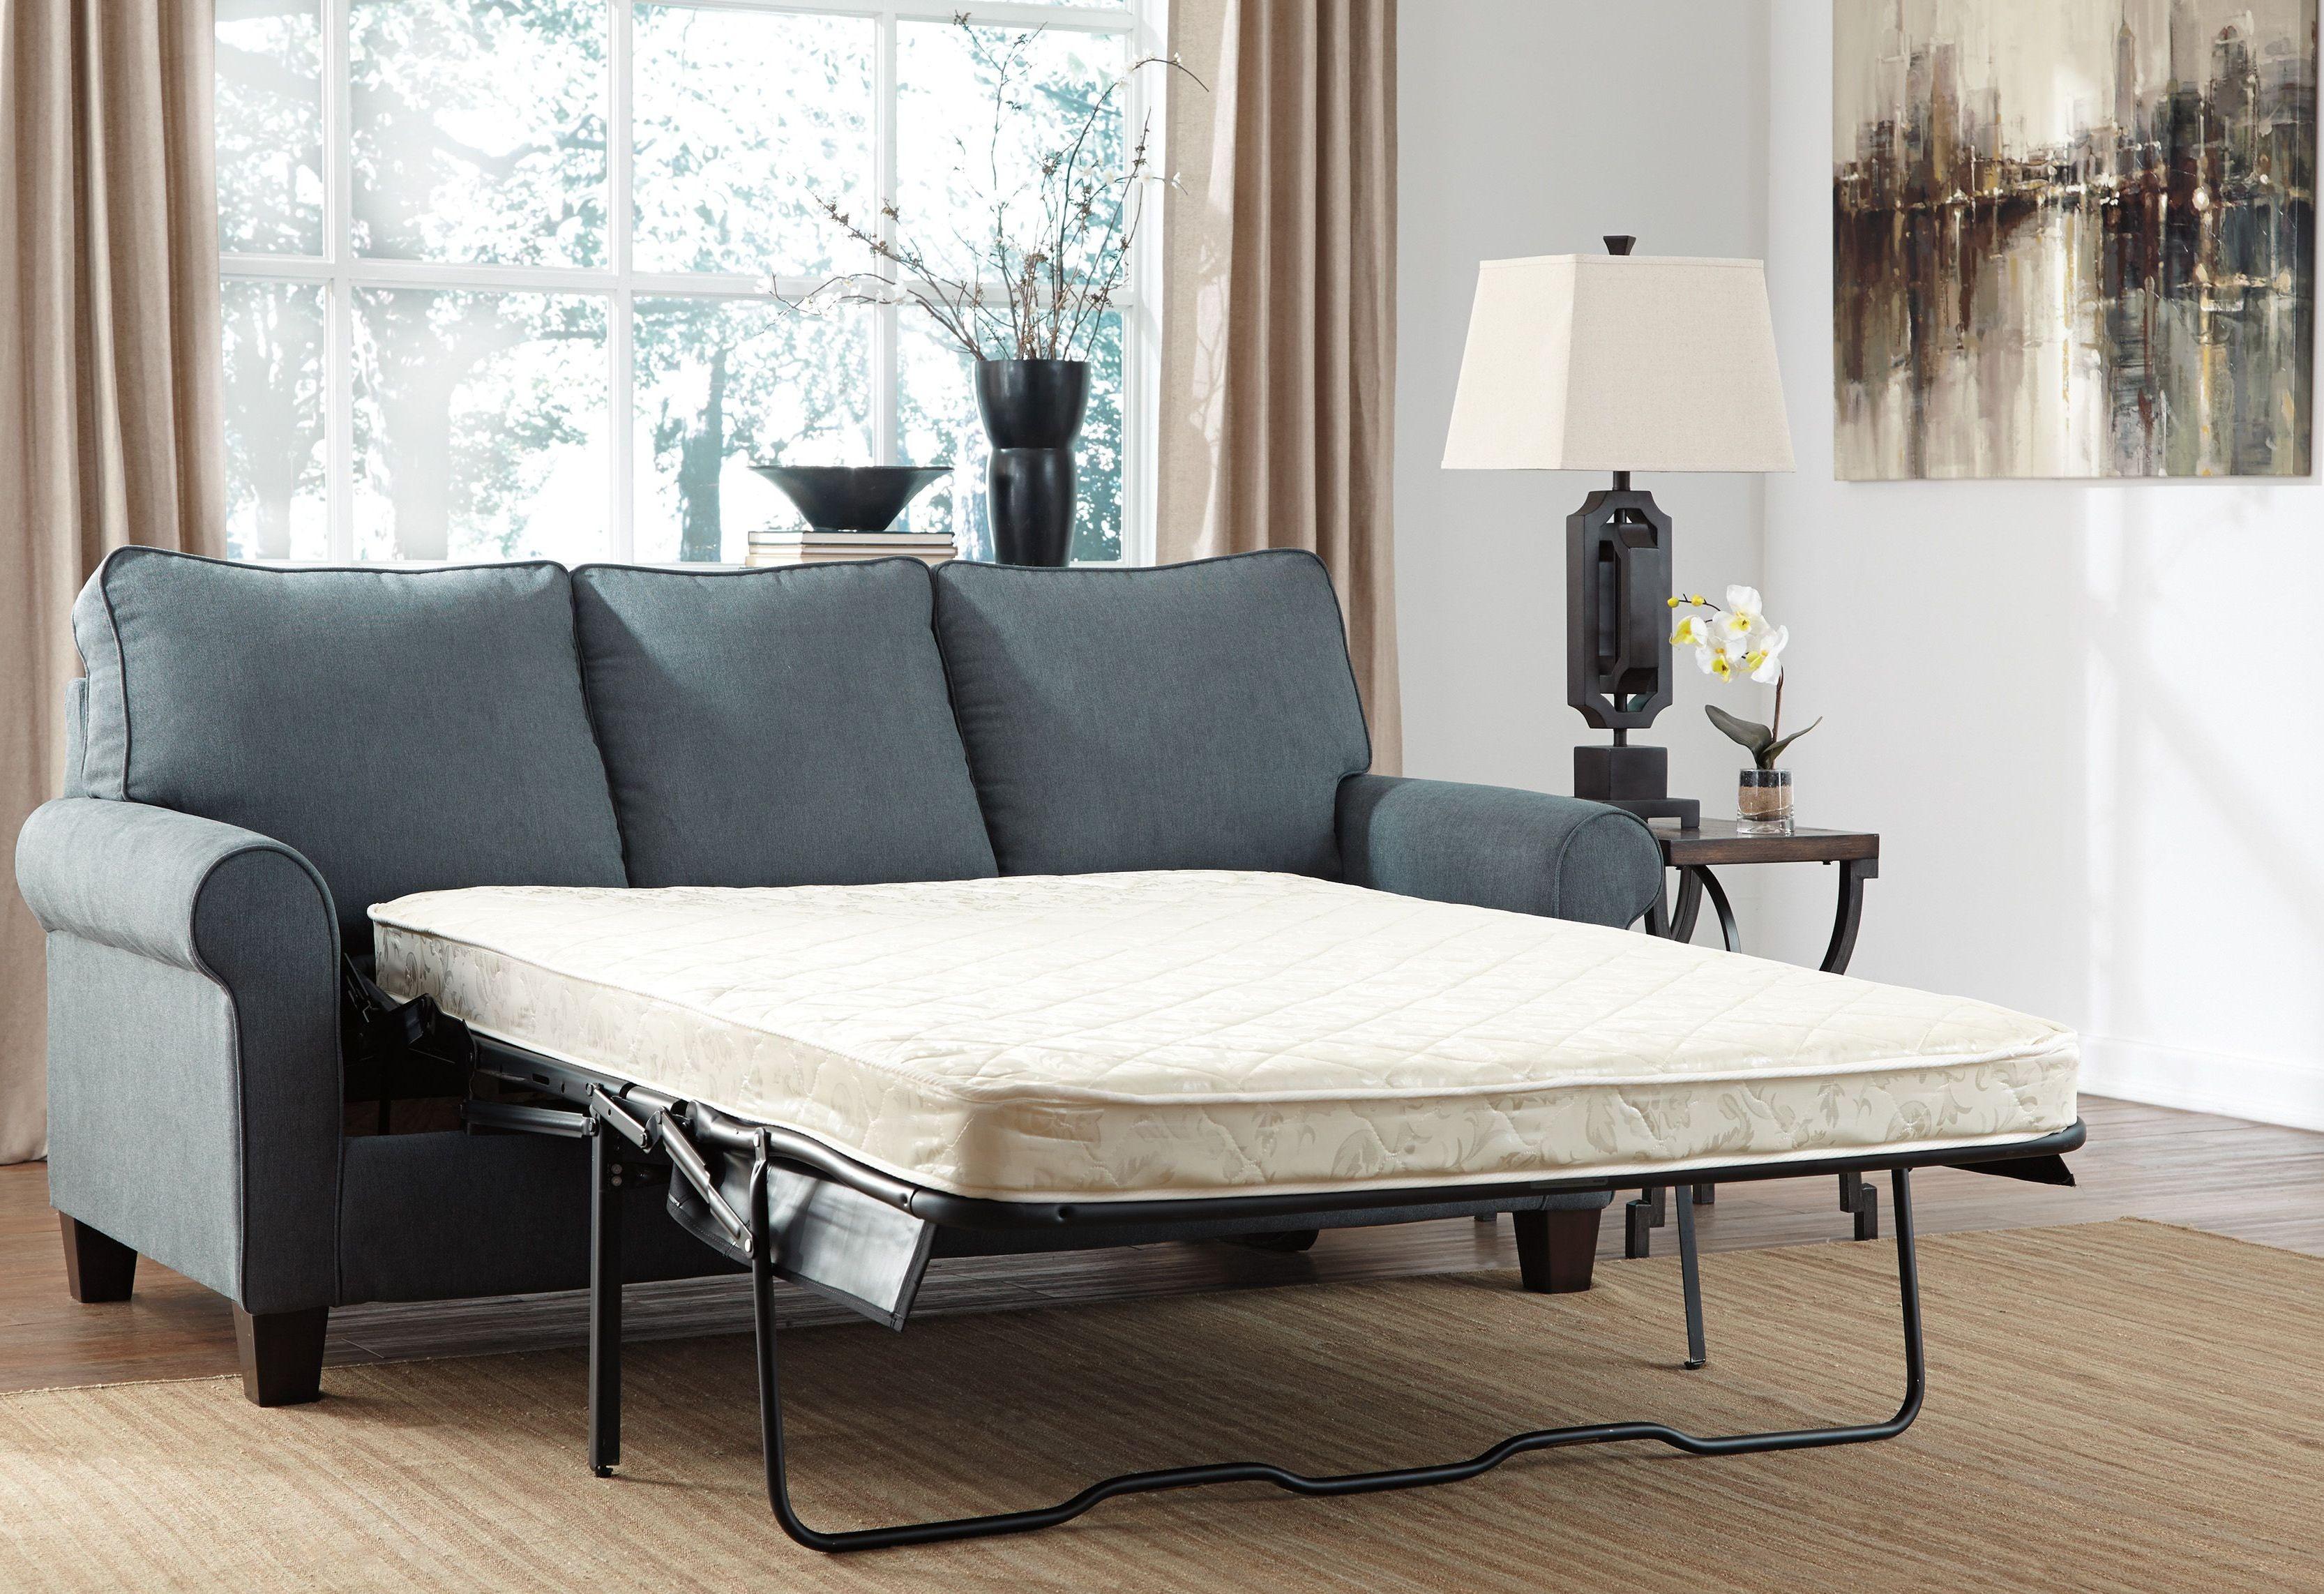 Zeth Denim Living Room Set From Ashley 2710137 25